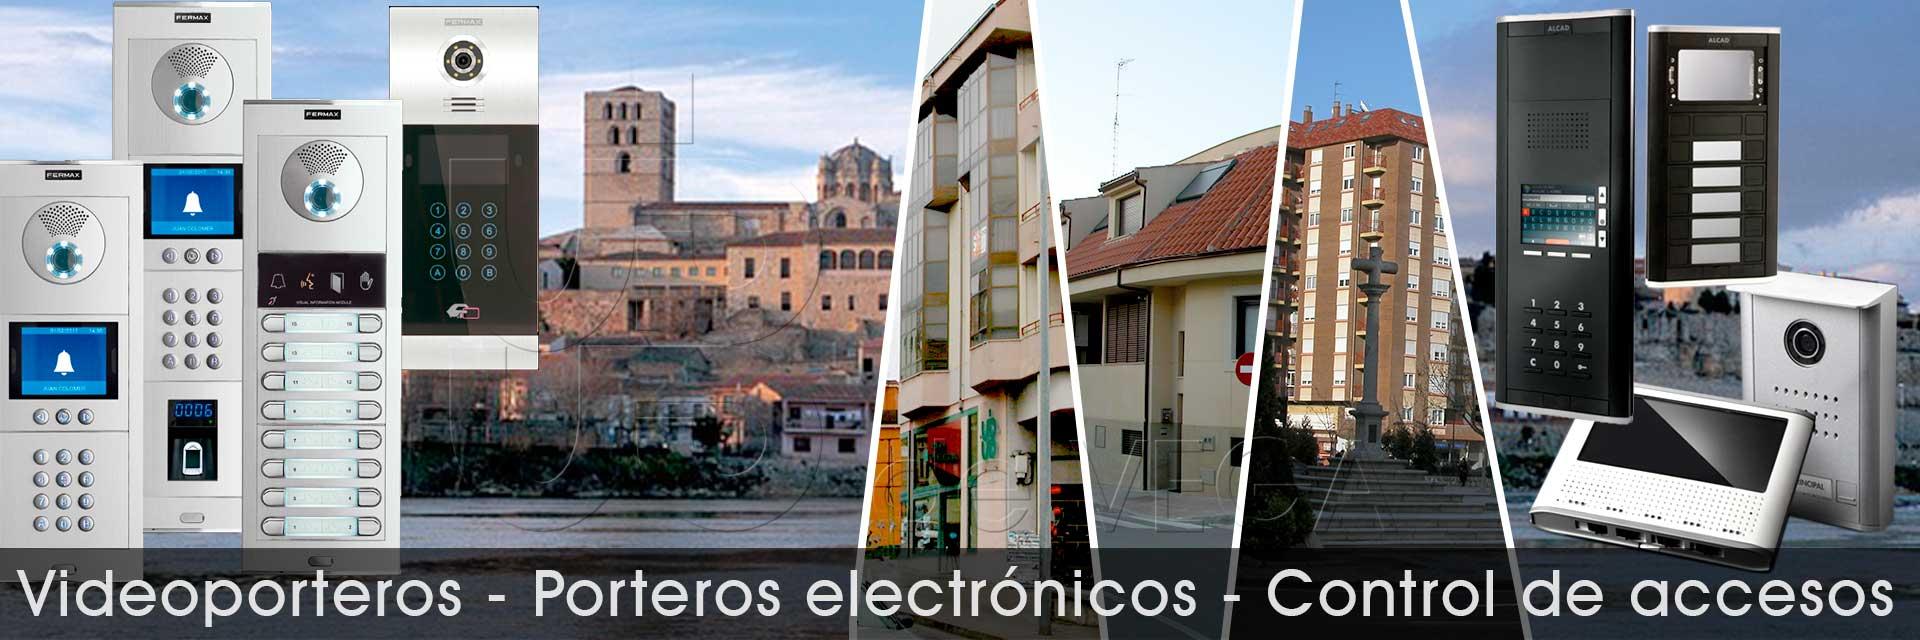 Video porteros. Porteros electrónicos. Control de accesos.